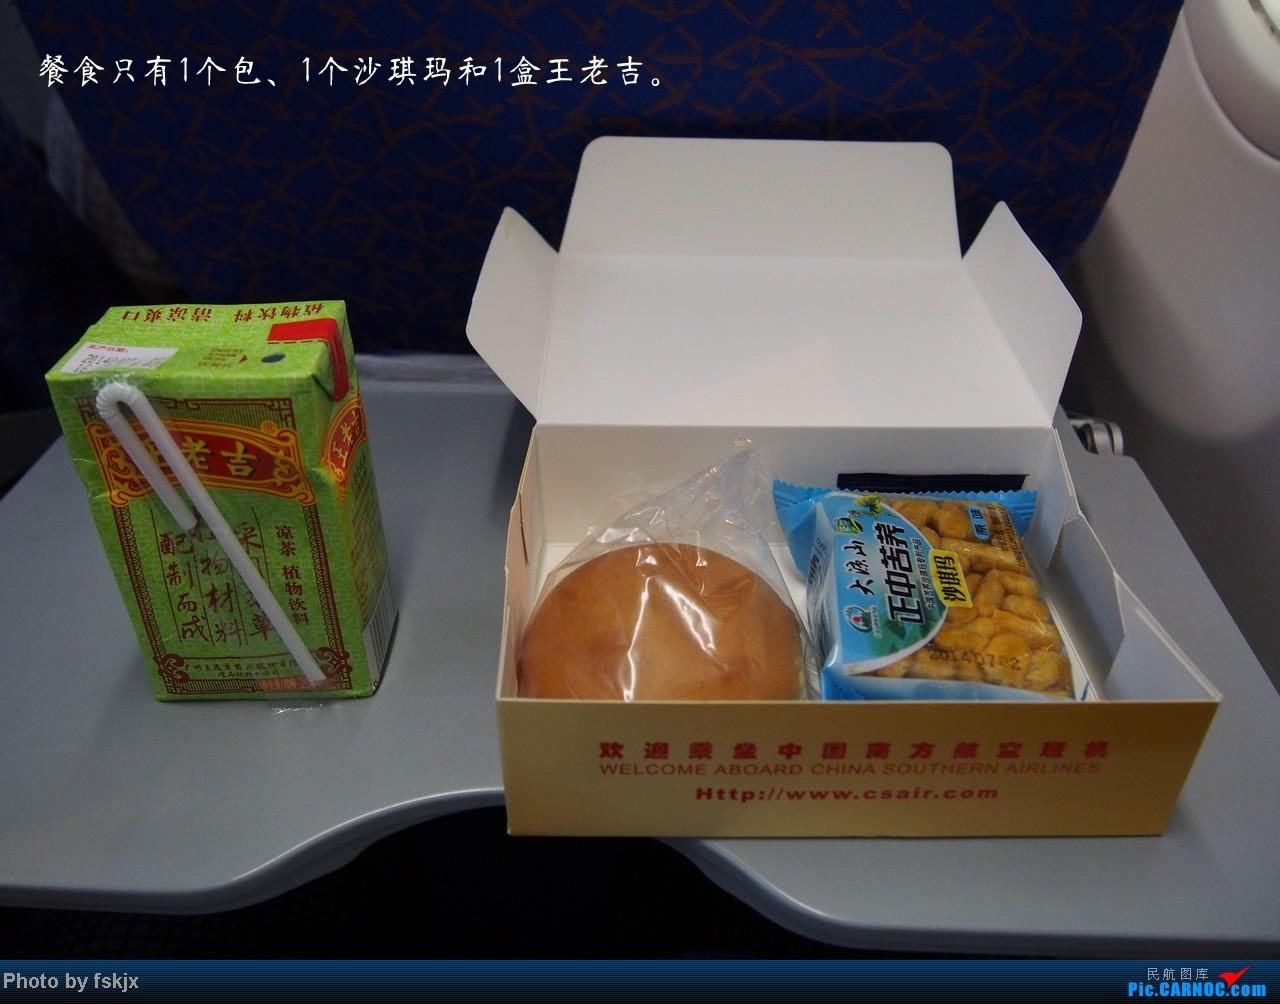 Re:【fskjx的飞行游记☆9】盛夏贵州避暑,感受壮观的黄果树瀑布 BOEING 737-800 B-5697